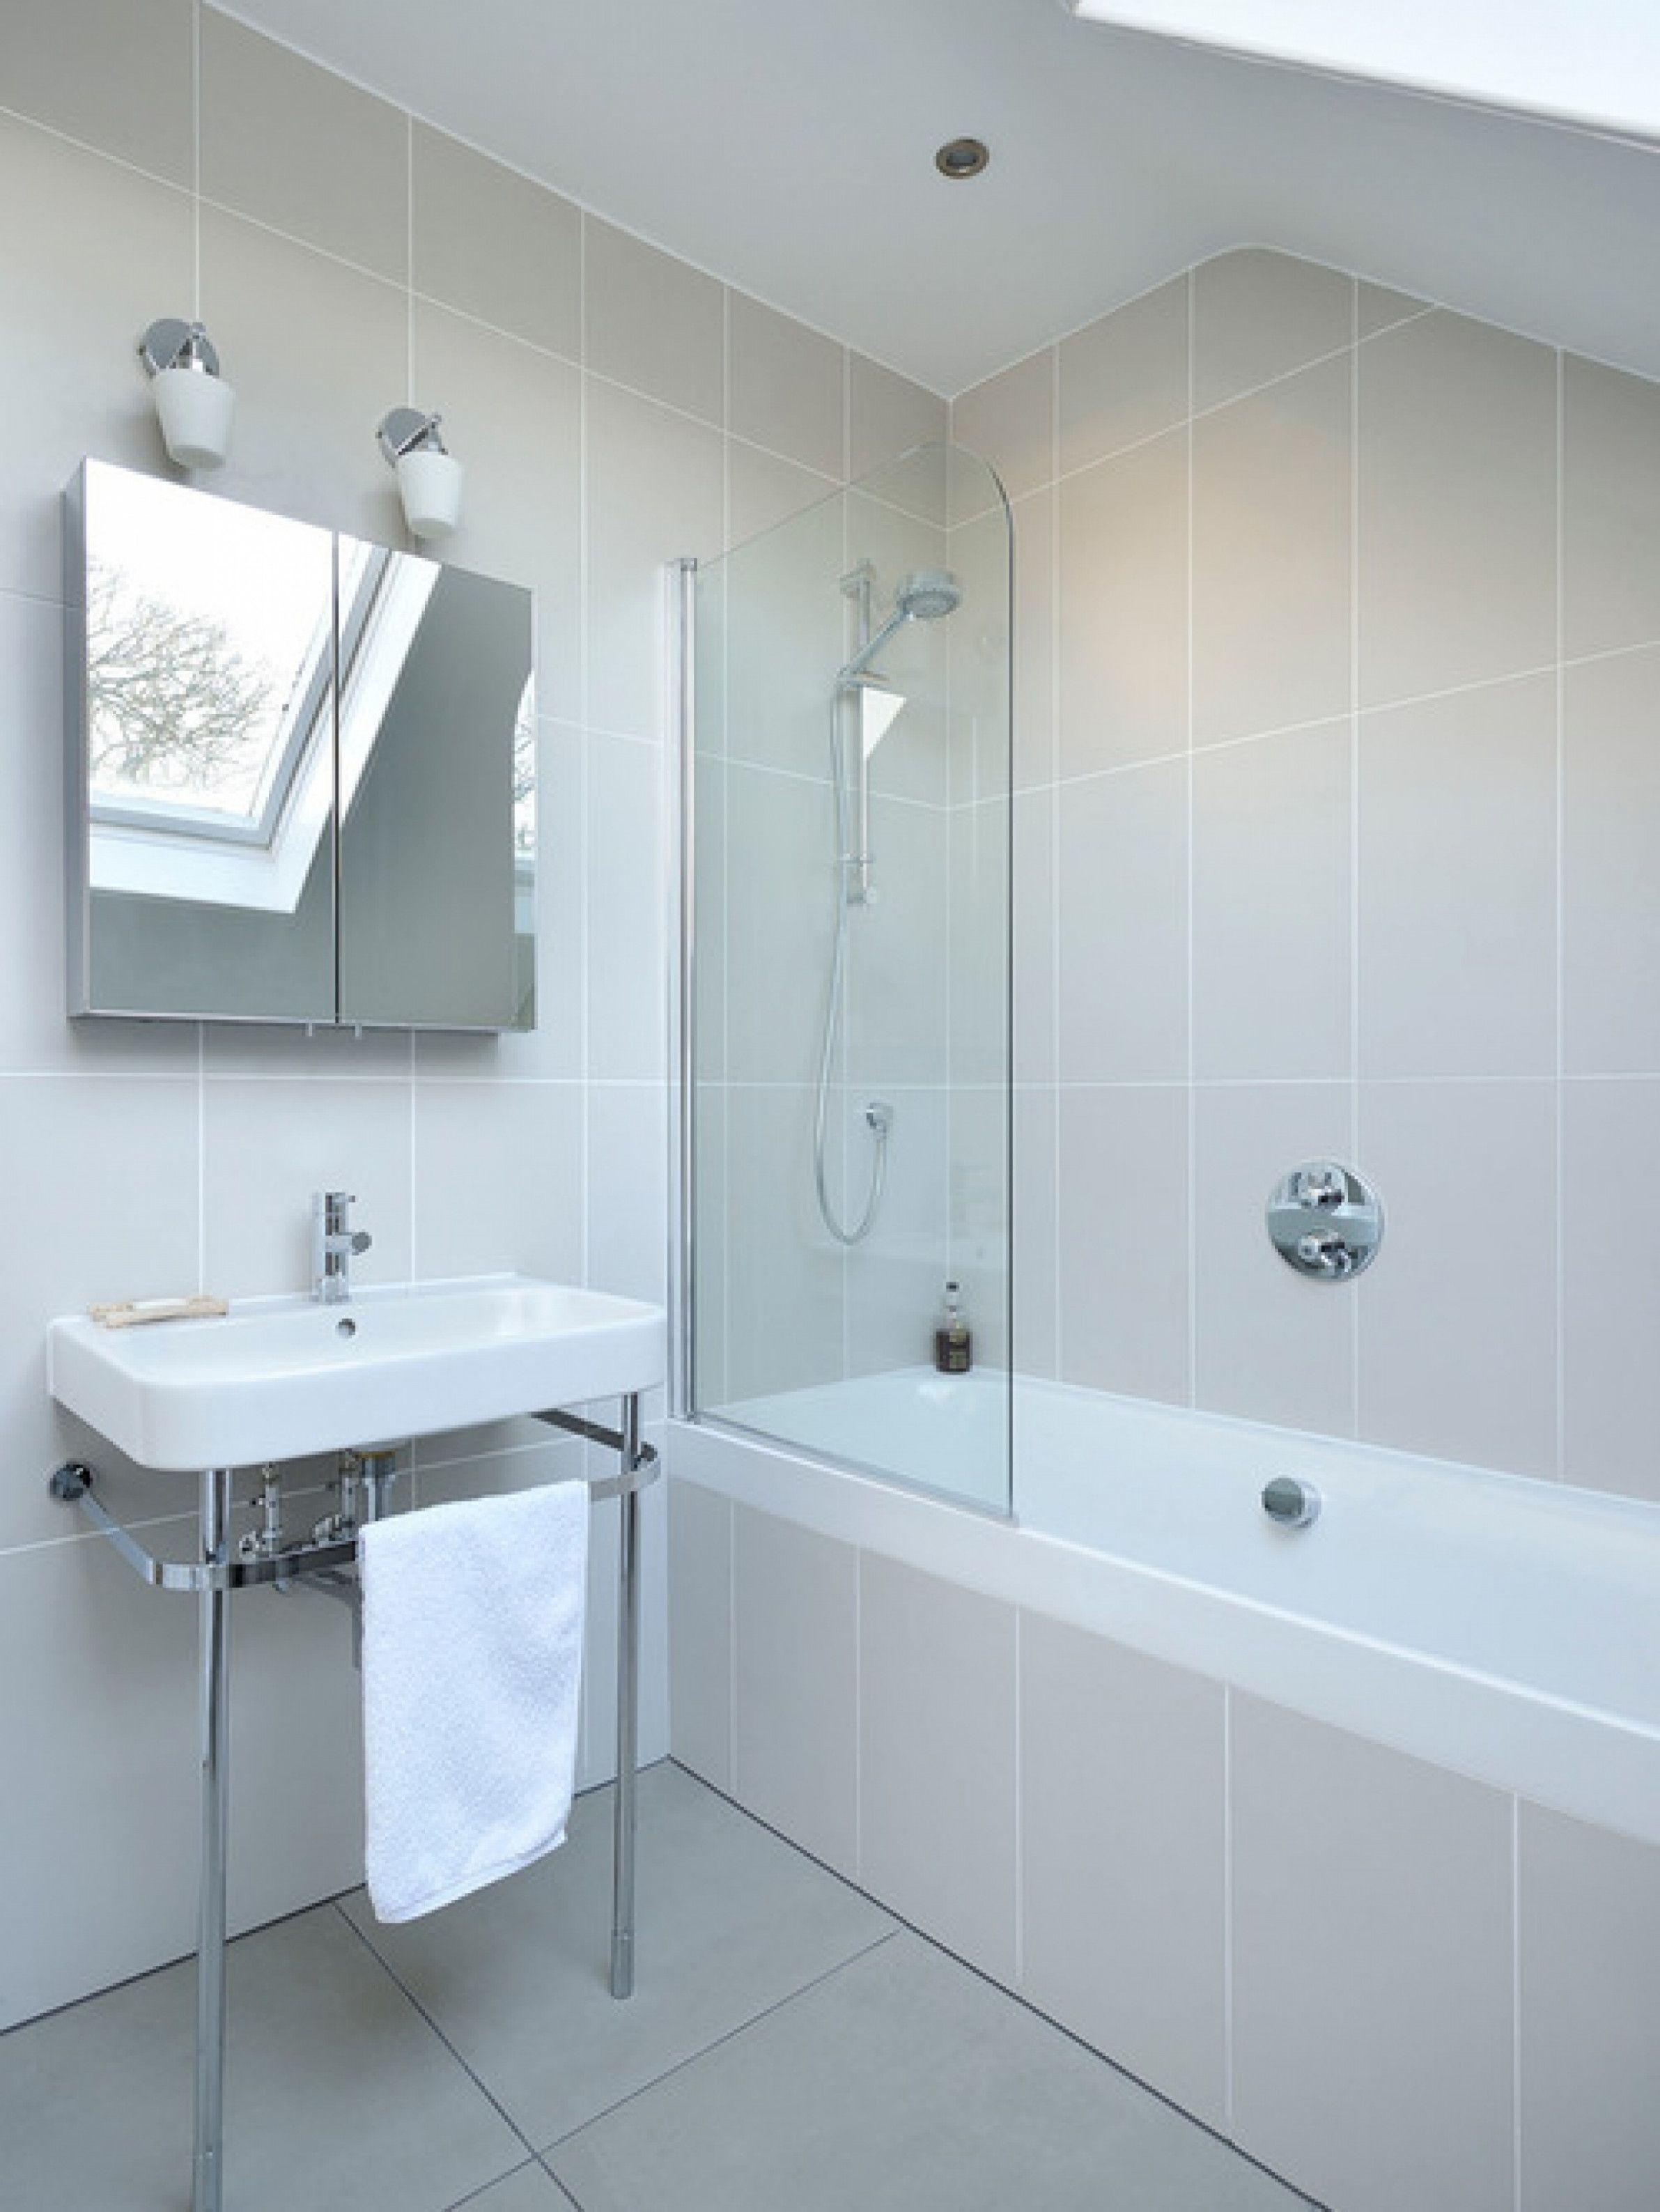 Toilet Small Bathroom Simple Design Appealing Ideas Tub 8mcdo arafen ...